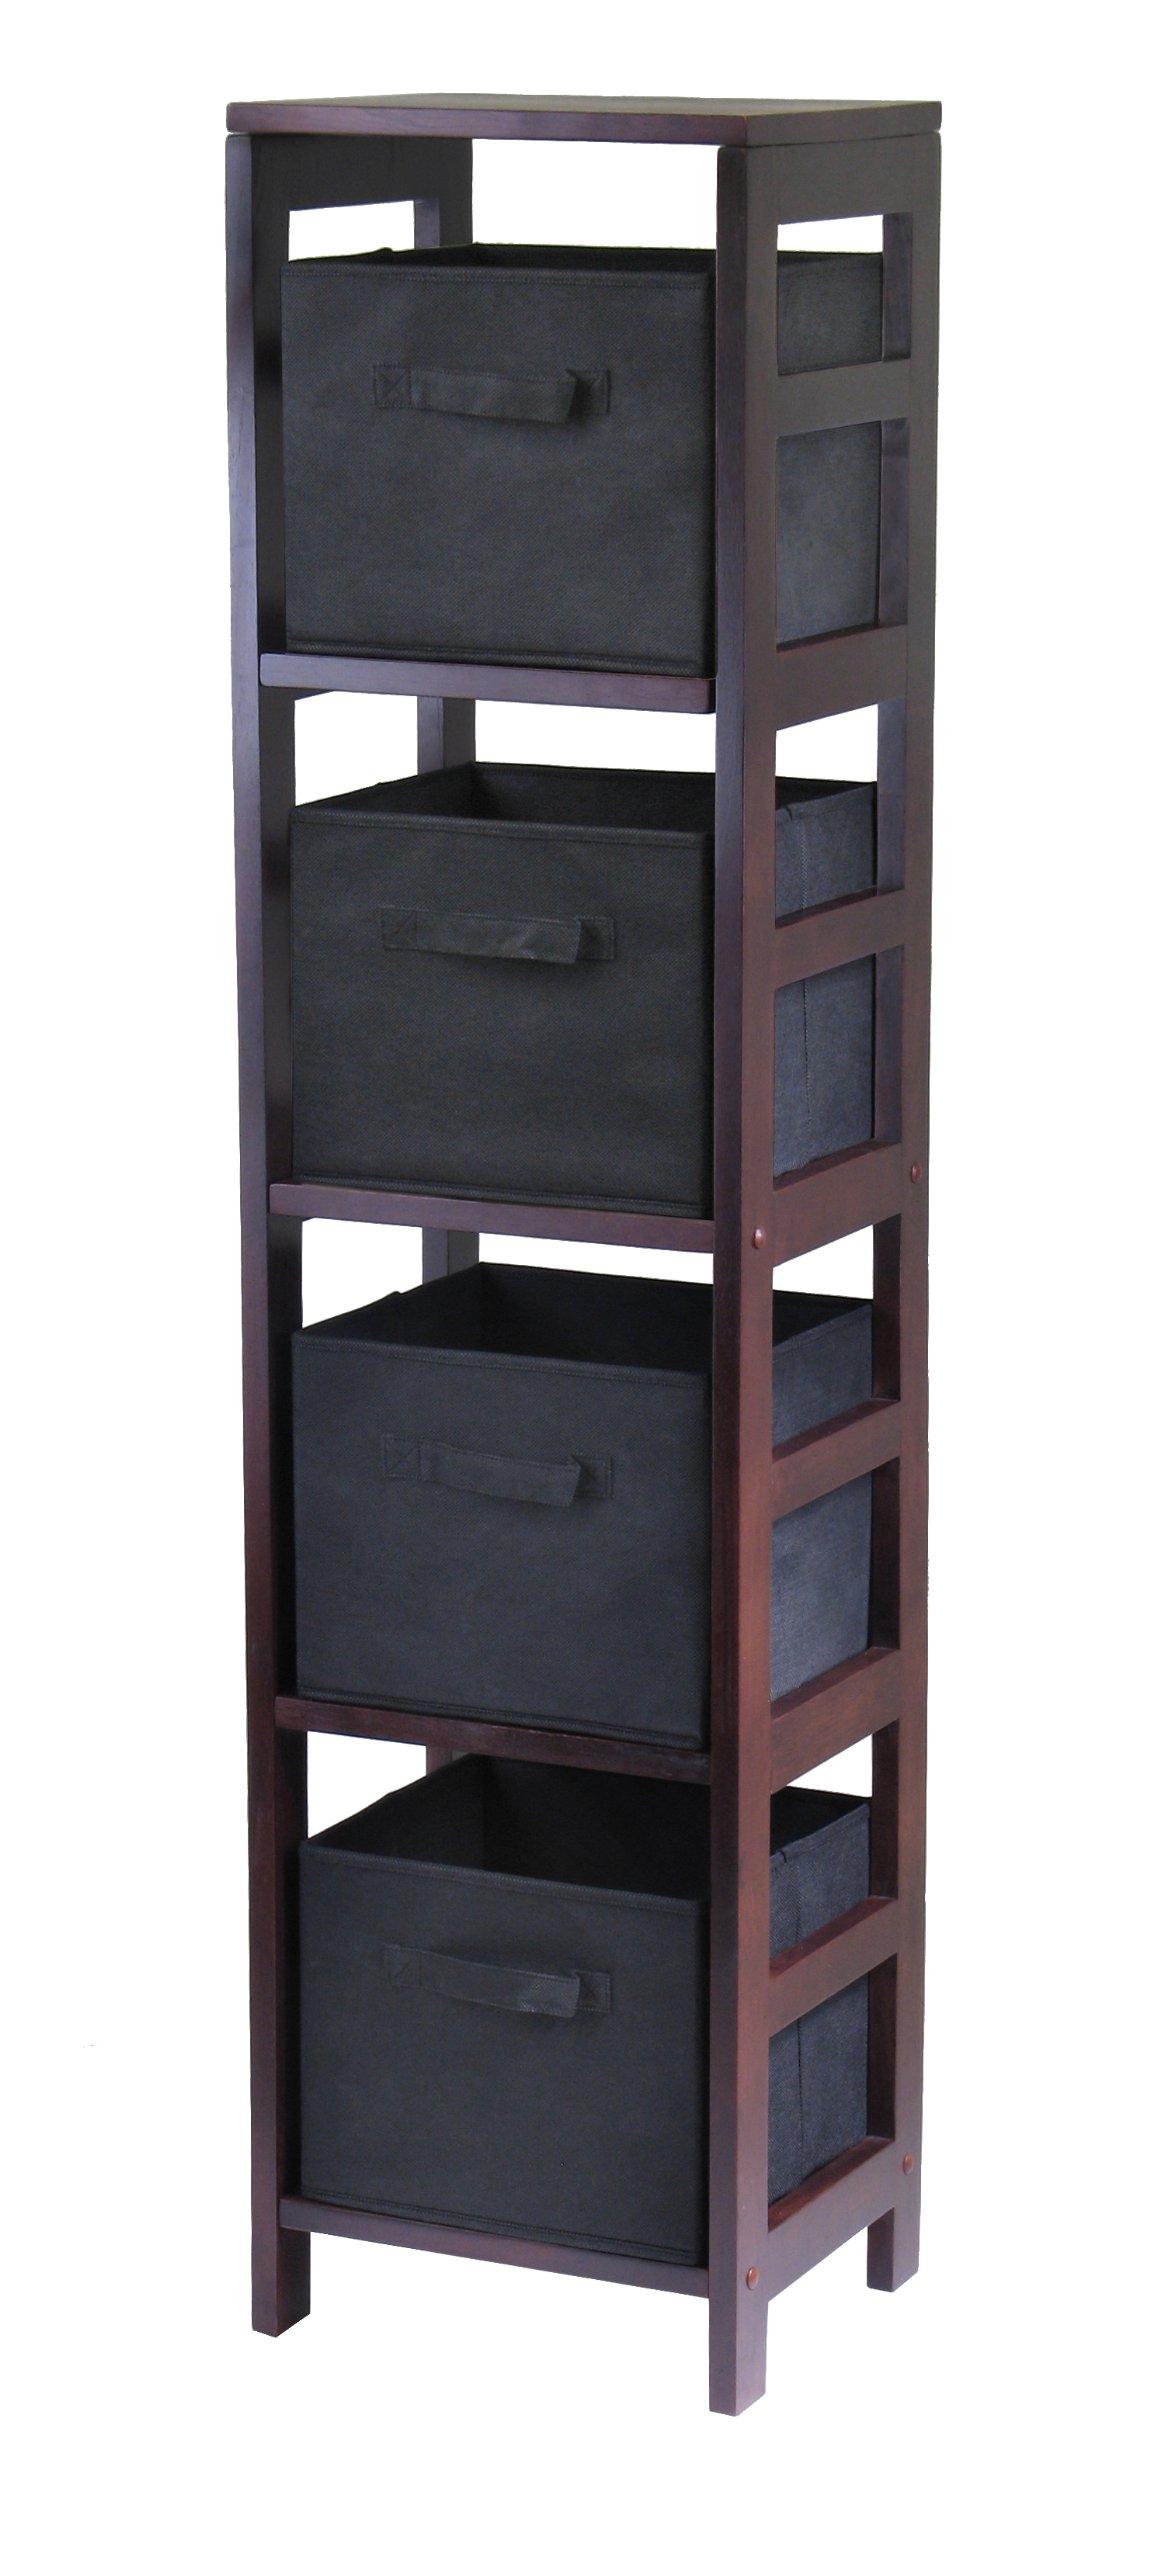 Winsome Wood Capri Wood 4 Section Storage Shelf with 4 Black Fabric Foldable Baskets